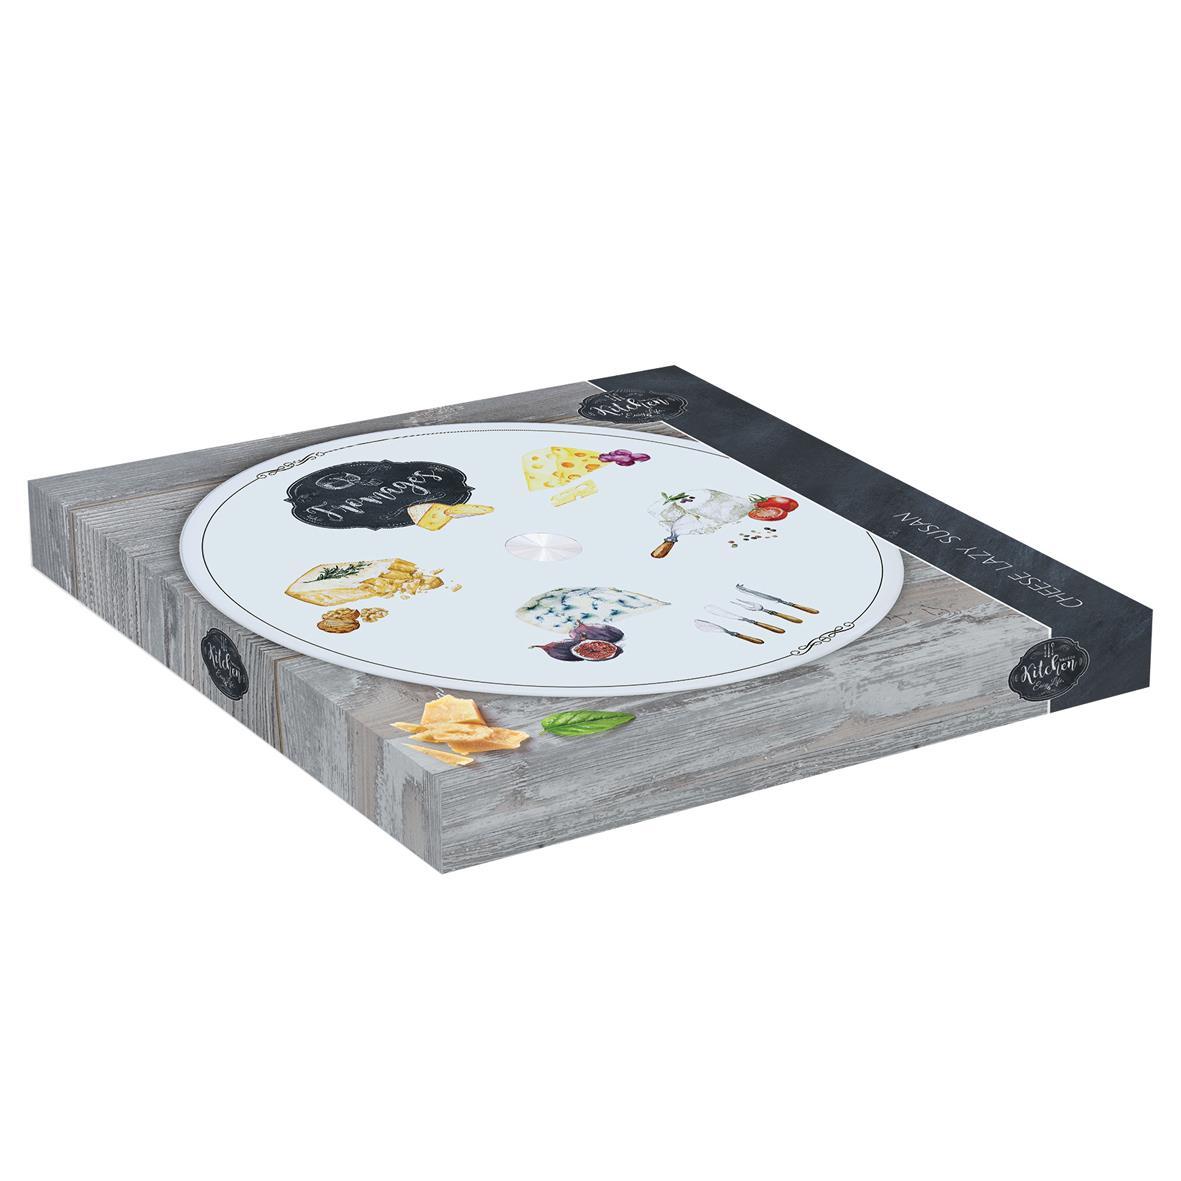 Сервировочная тарелка на подставке для сыра Easy Life KITCHEN BASIC FROMAGES, 32 см